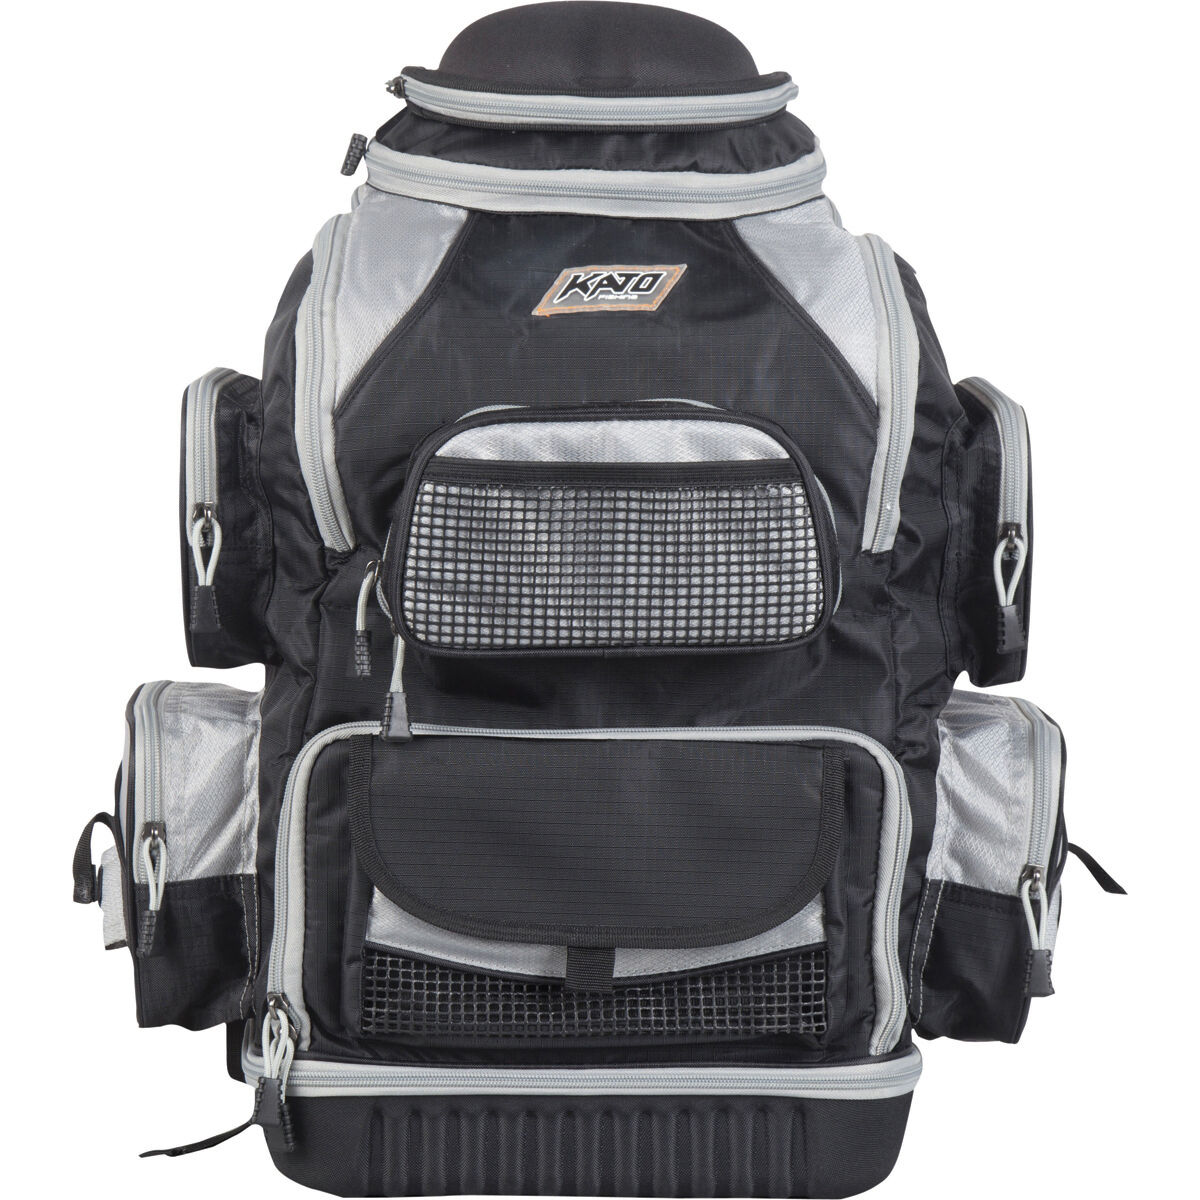 Kato Trekking Pack Tackle Bag Bcf